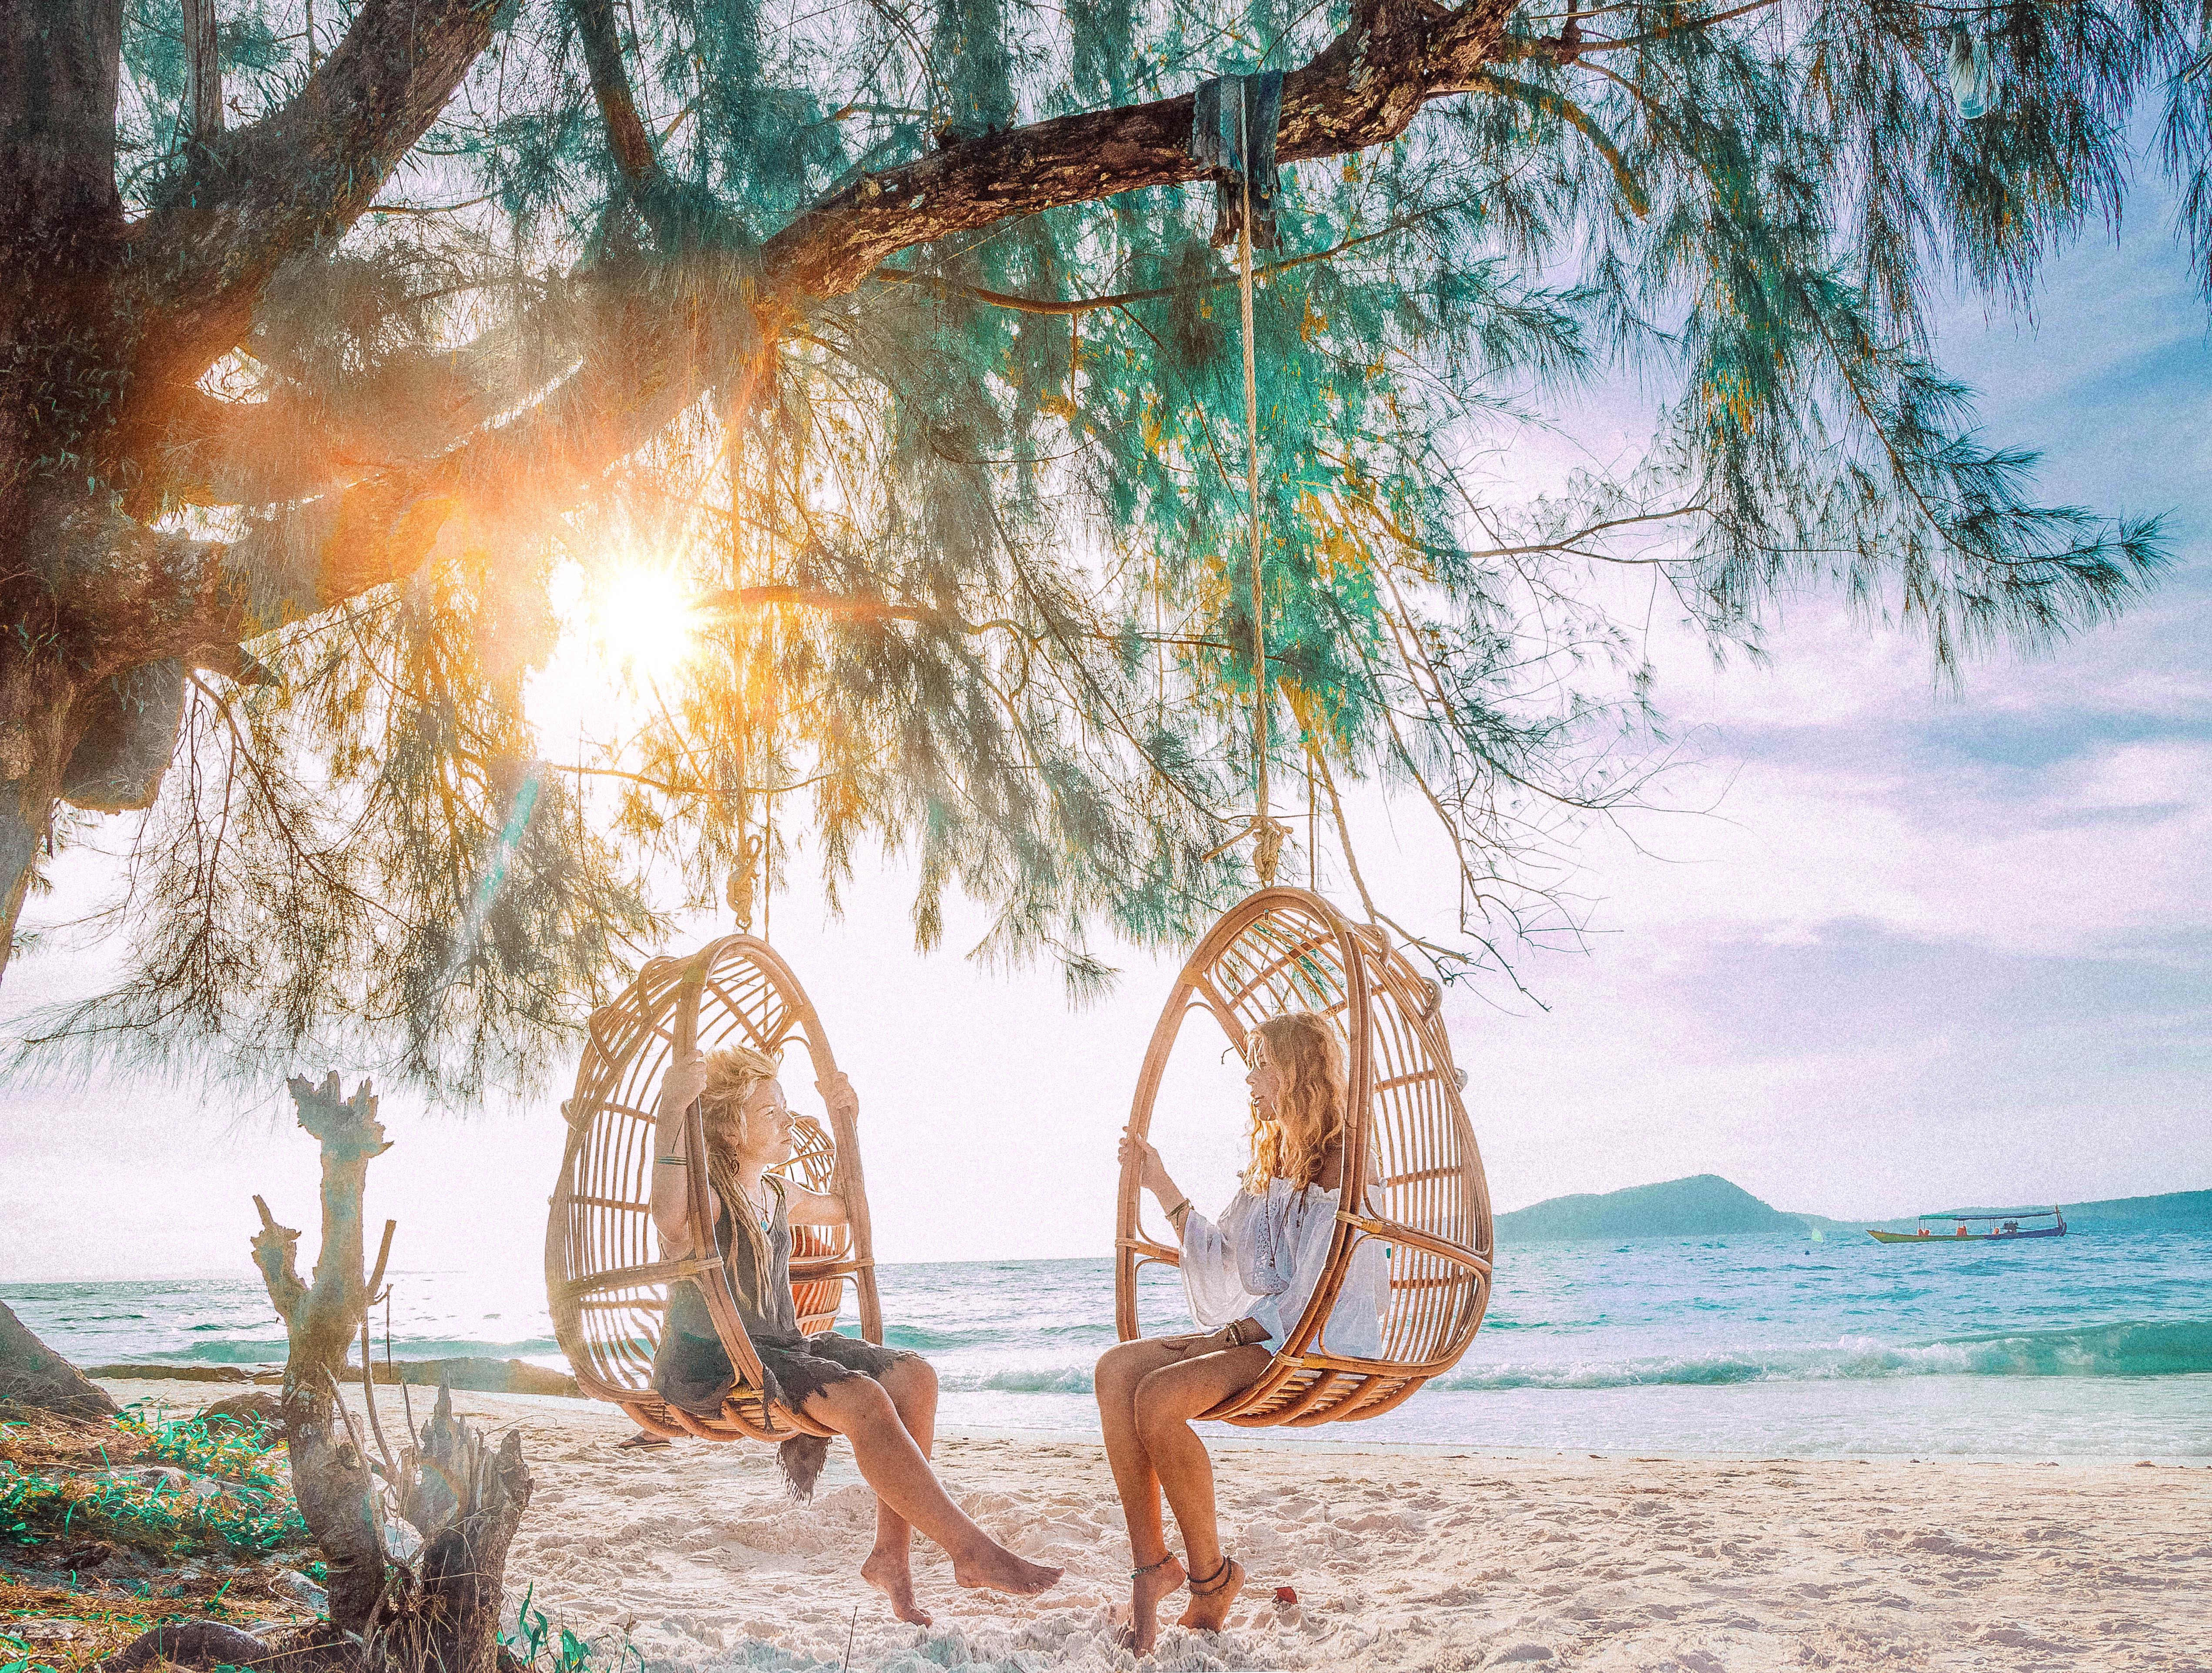 koh rong island so beautiful with sandy white beaches sunrise blue water palms hammocks